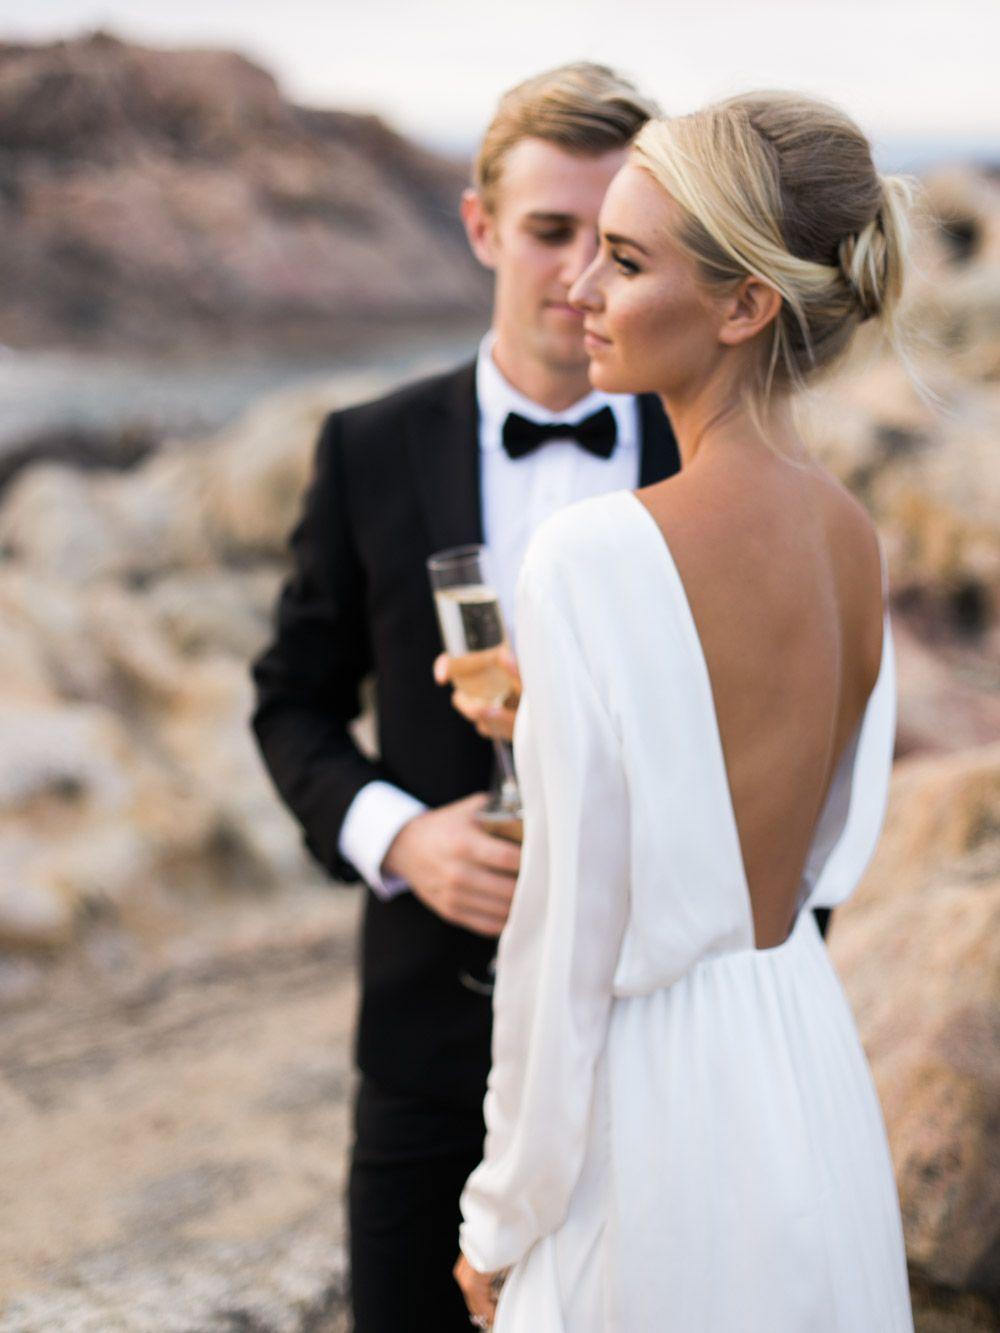 Simple wedding dresses for eloping  Canal Rocks Elopement Katie Grant Photographyg  Alisonus